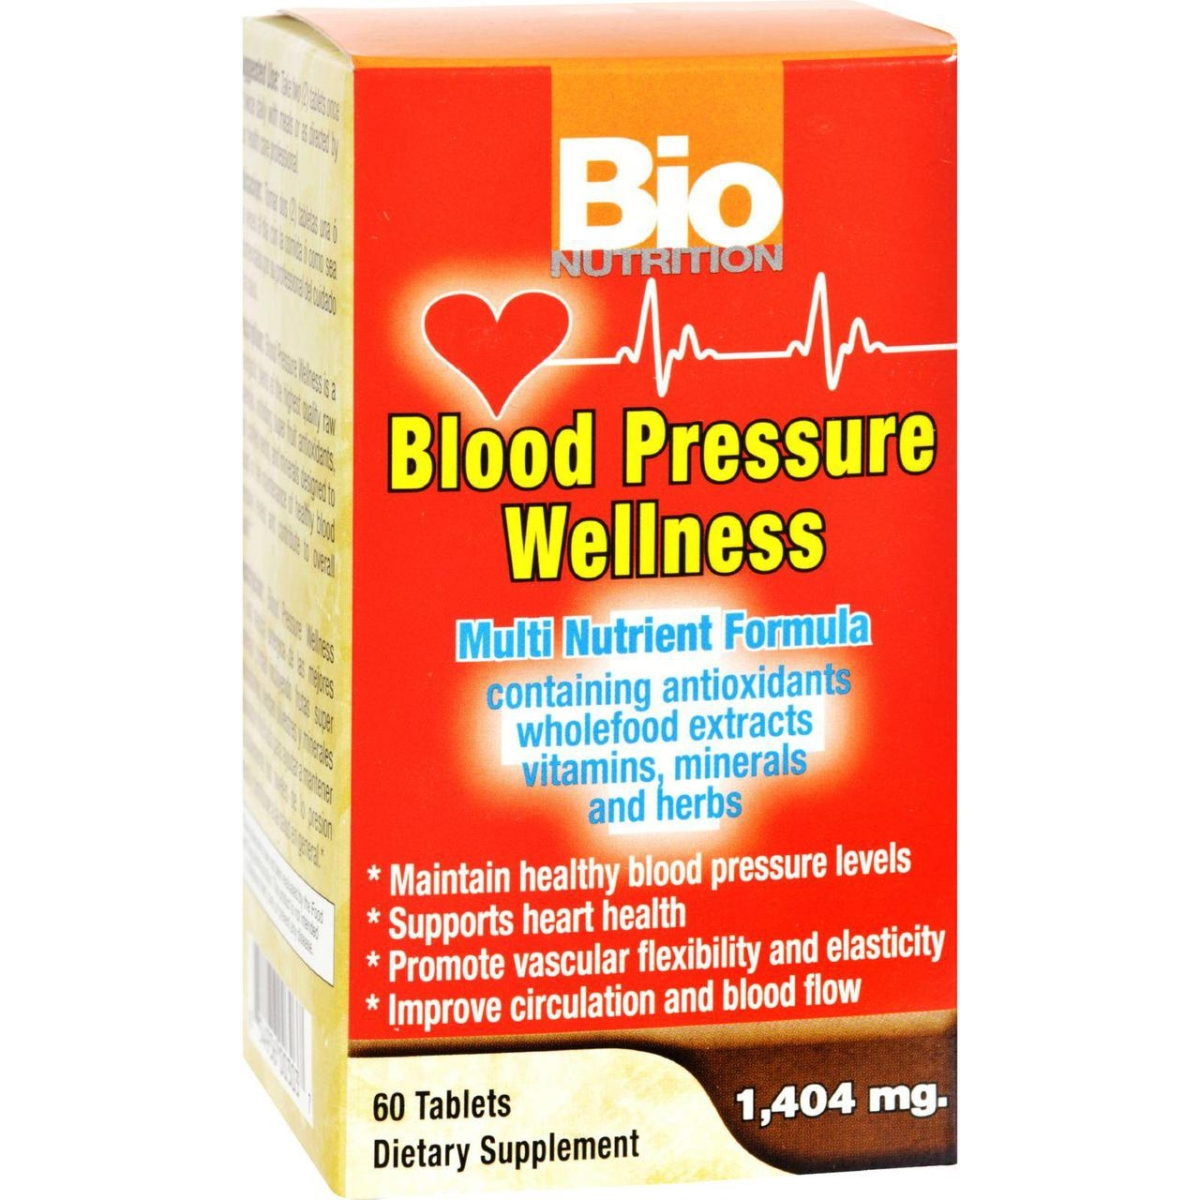 Bio Nutrition HG1029545 Blood Pressure Wellness - 60 Tablets